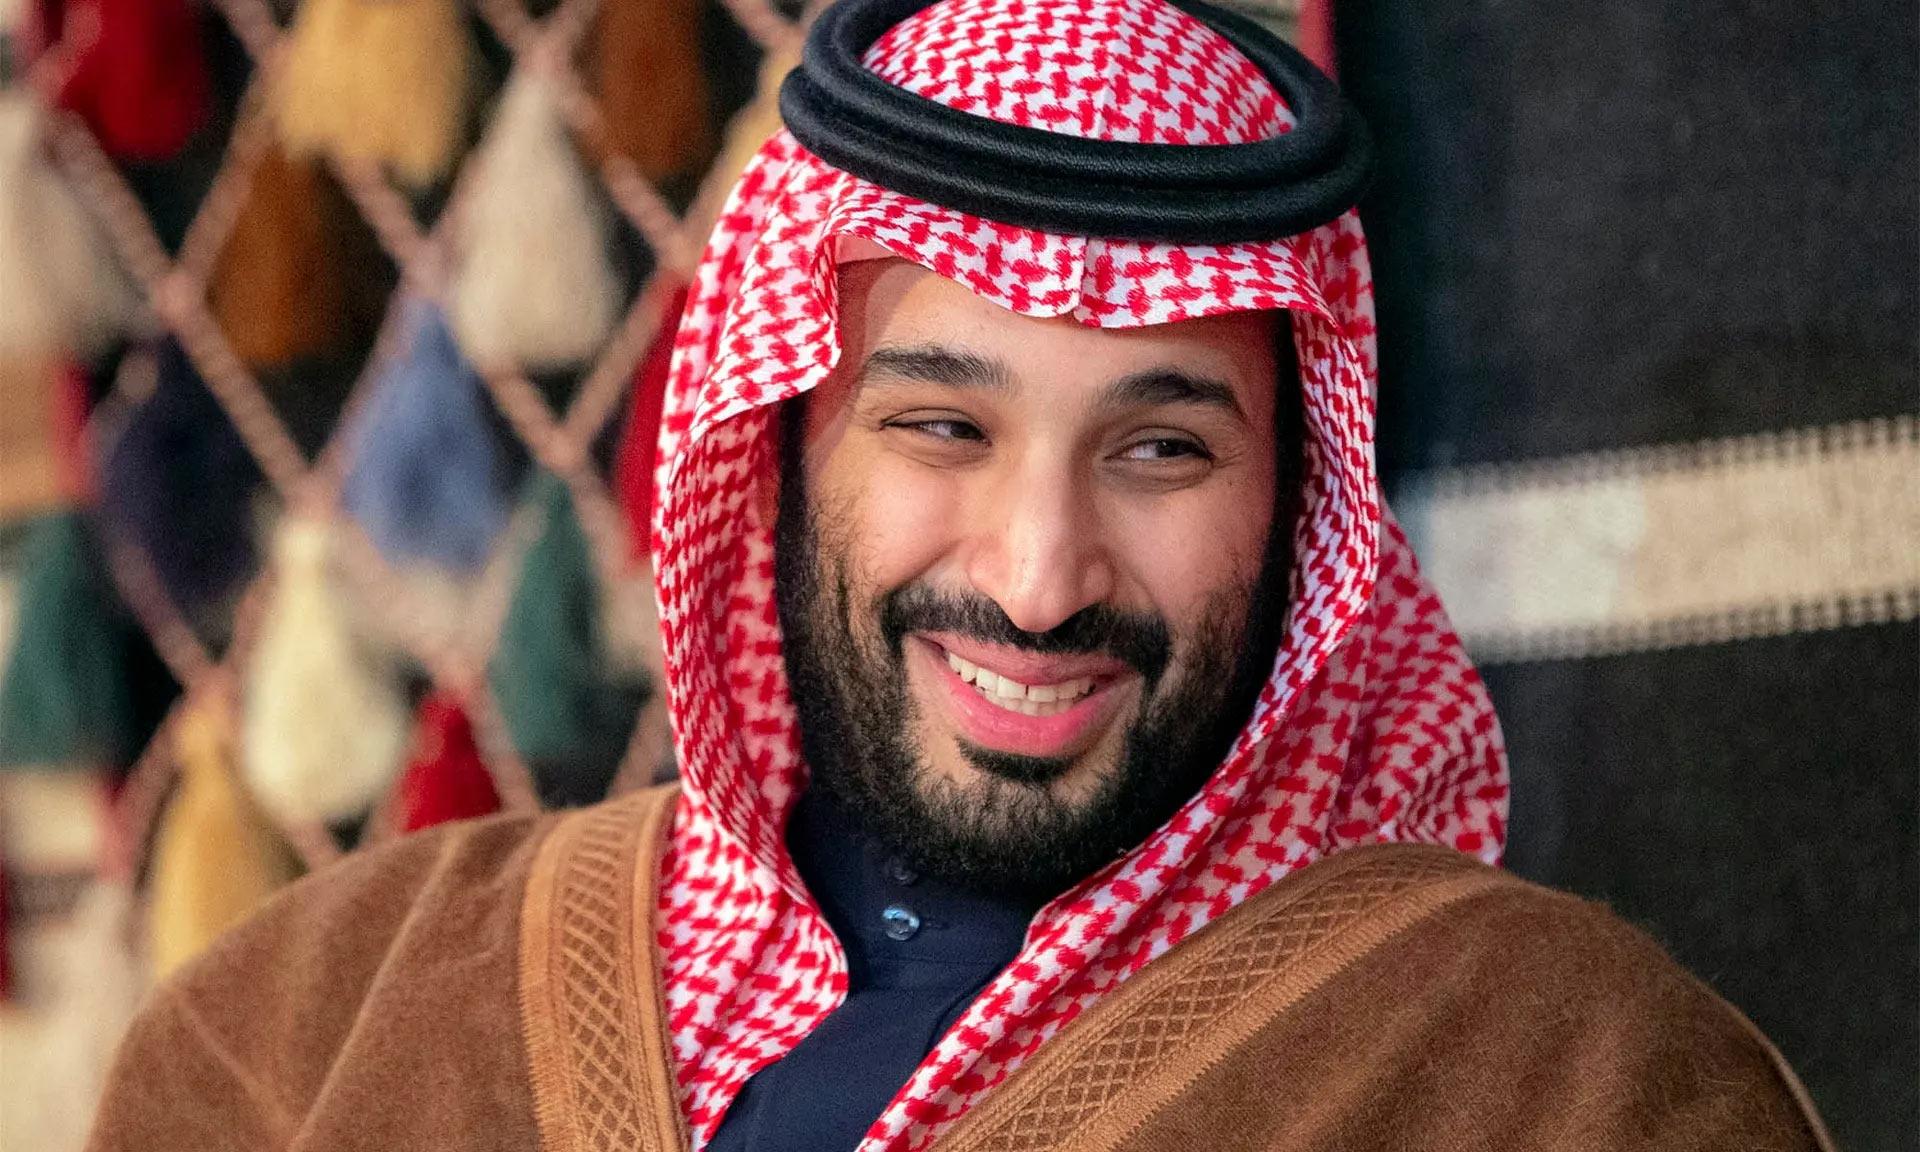 принц Мухаммед бин Салман